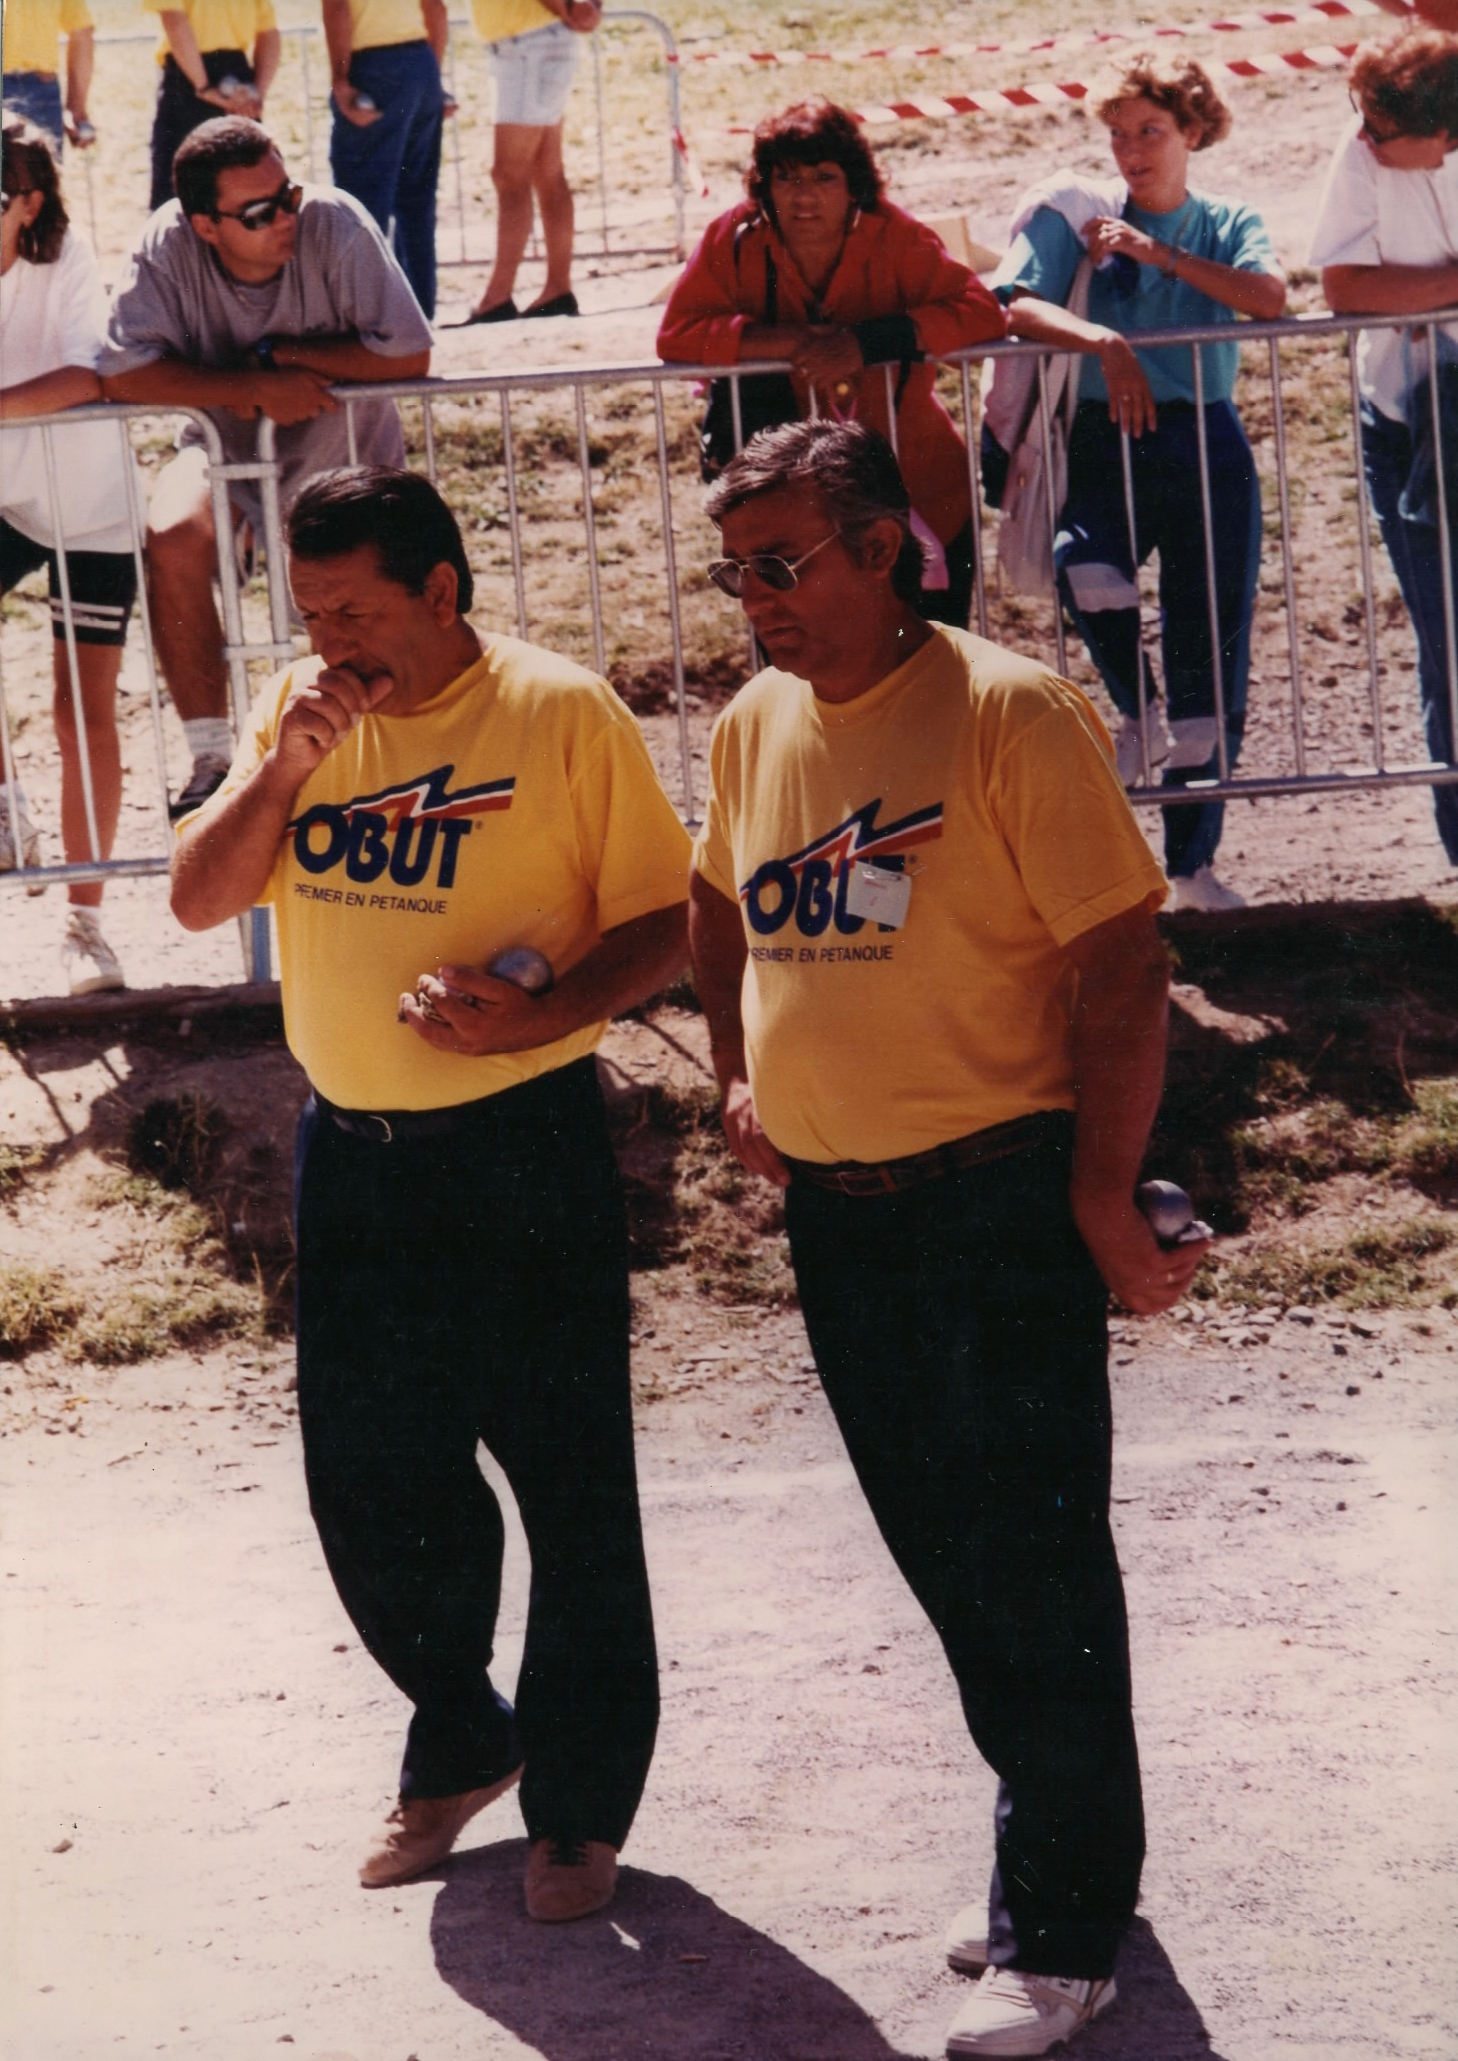 La doublette championne des Alpes-Maritimes 1992 Jean-Marc BRANCHETTI et Daniel ARMANDO